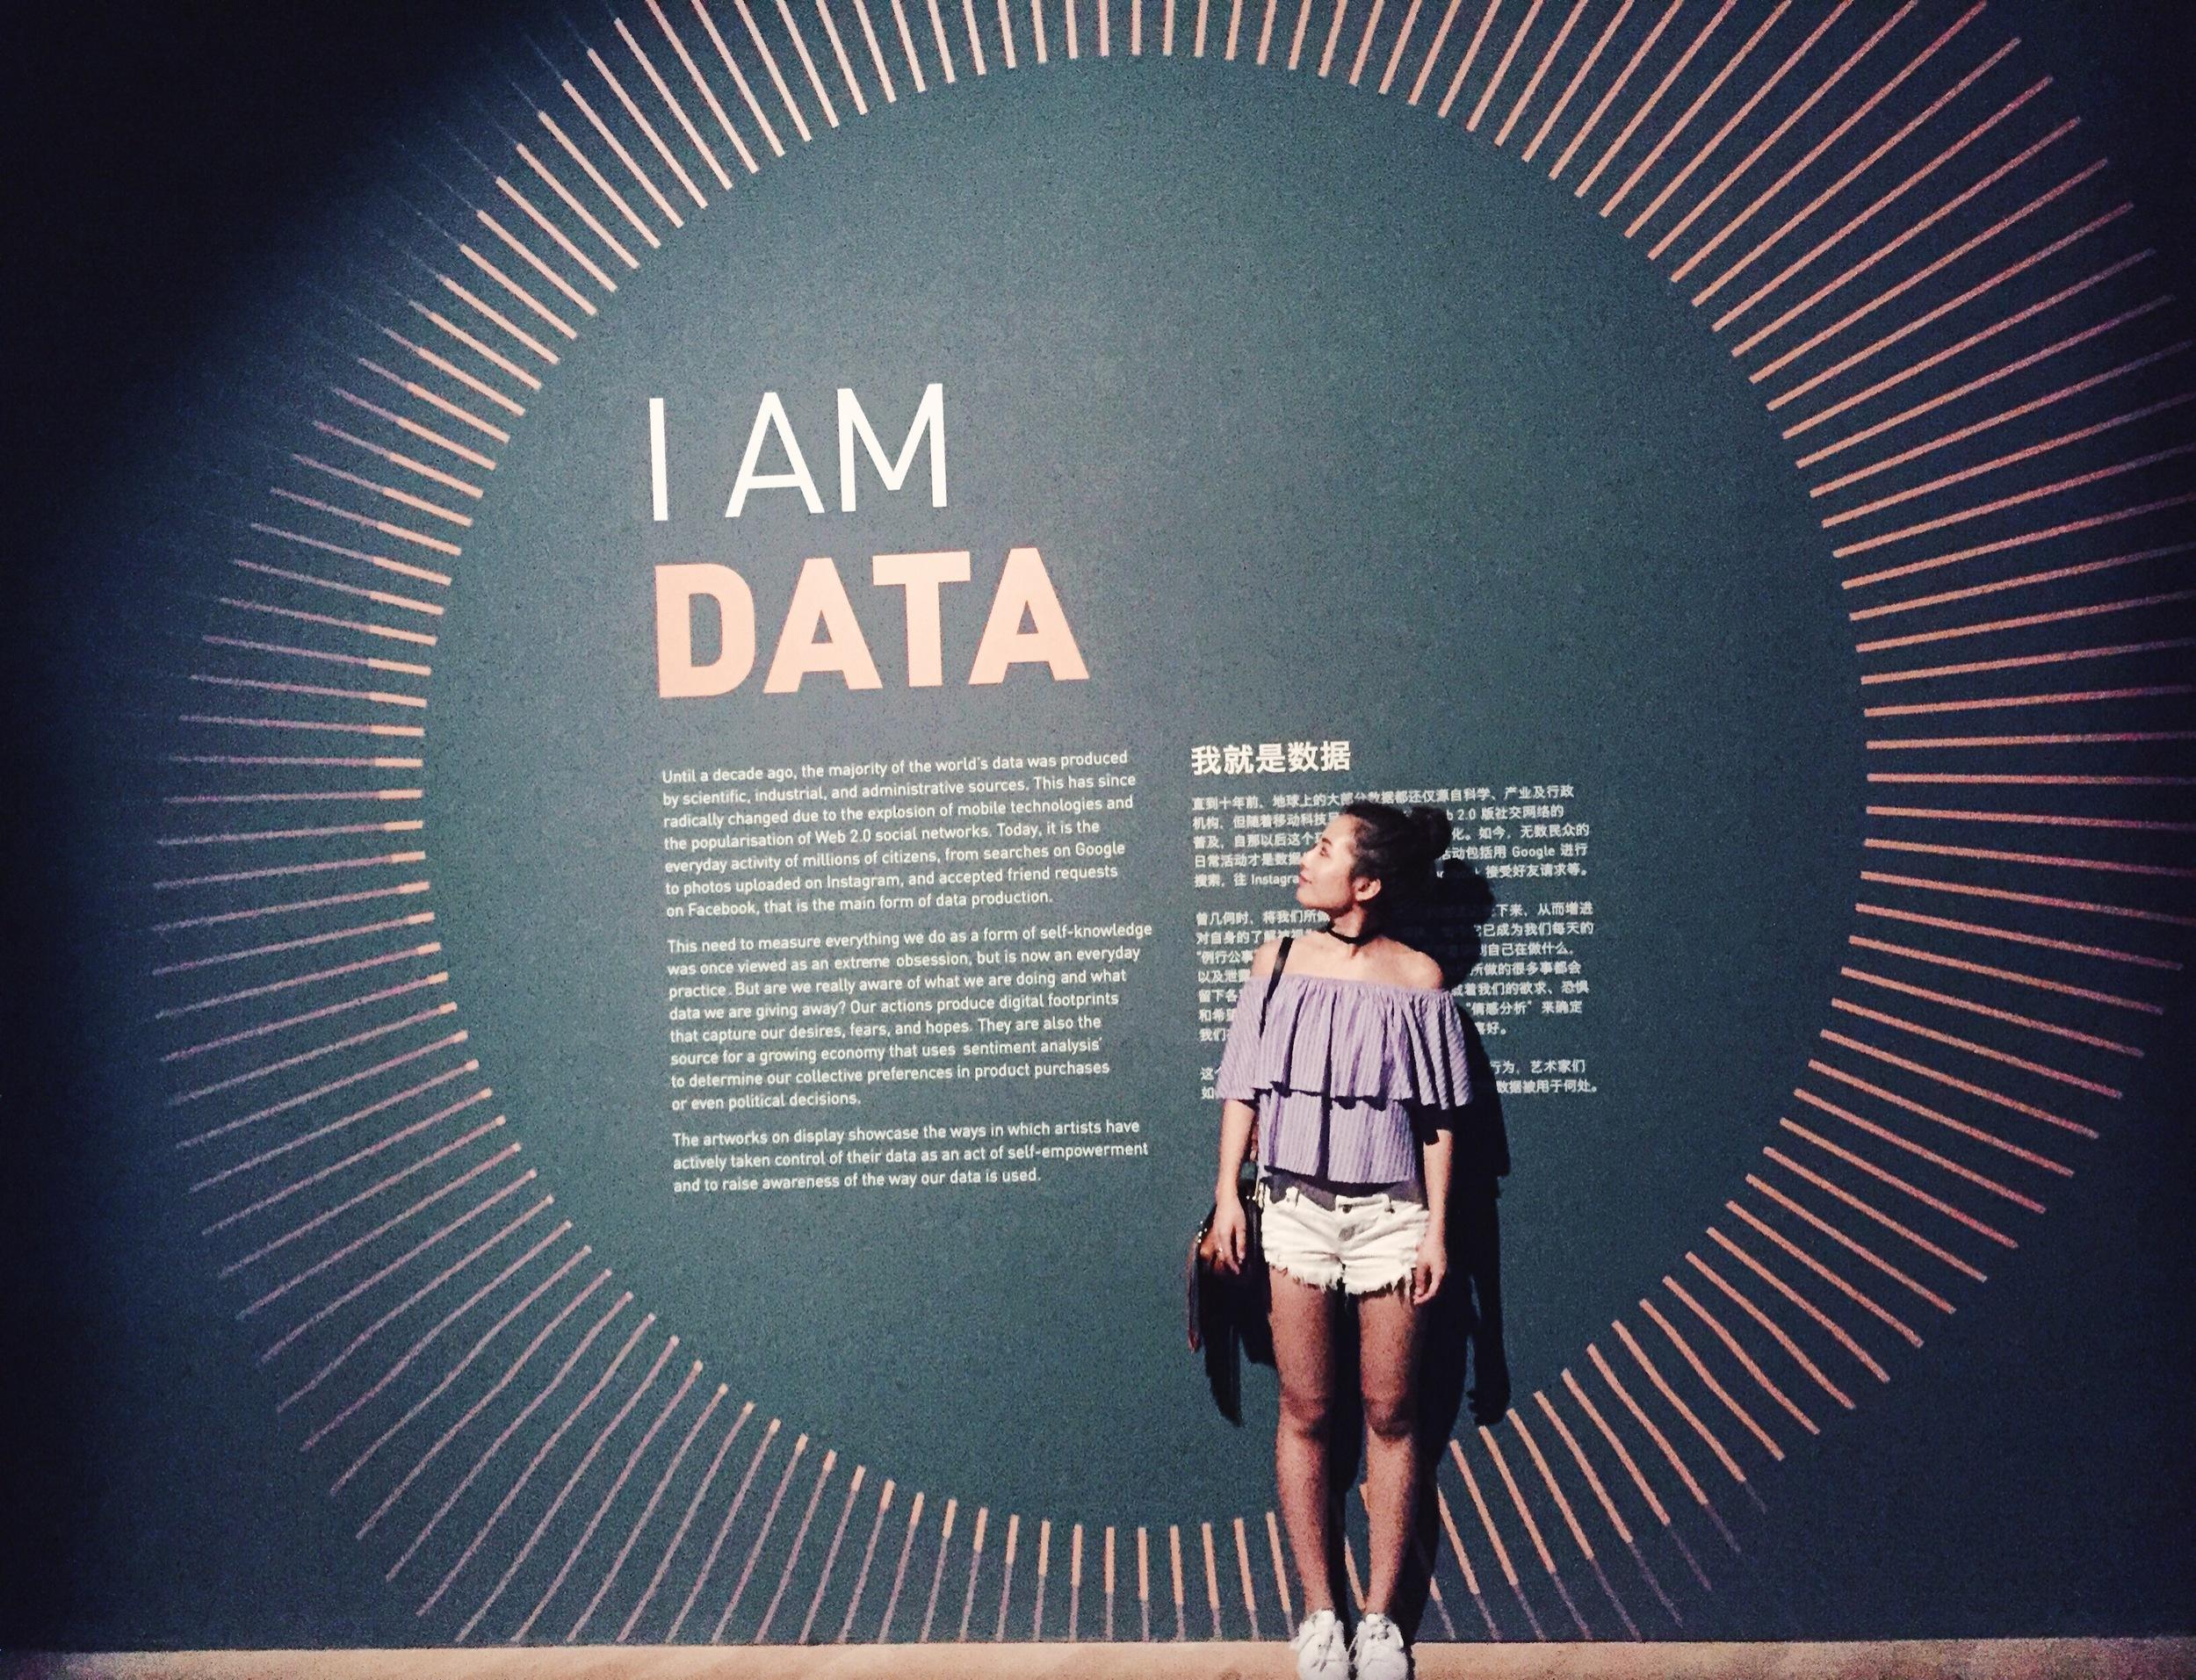 2016 summer at Singapore ArtScience Museum - Big Bang Data exhibition.